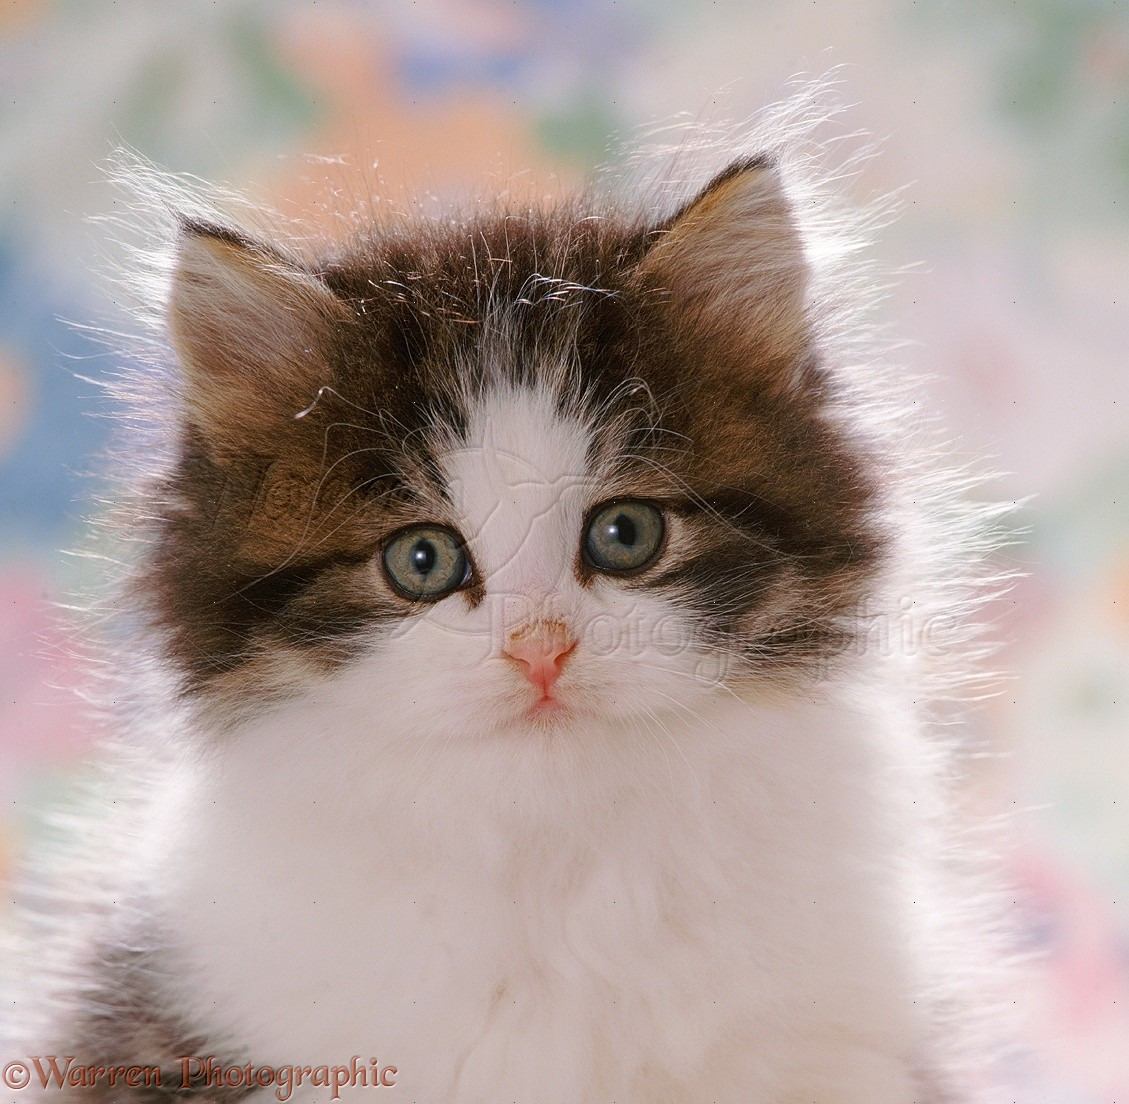 fluffy tabbyandwhite kitten photo wp37688